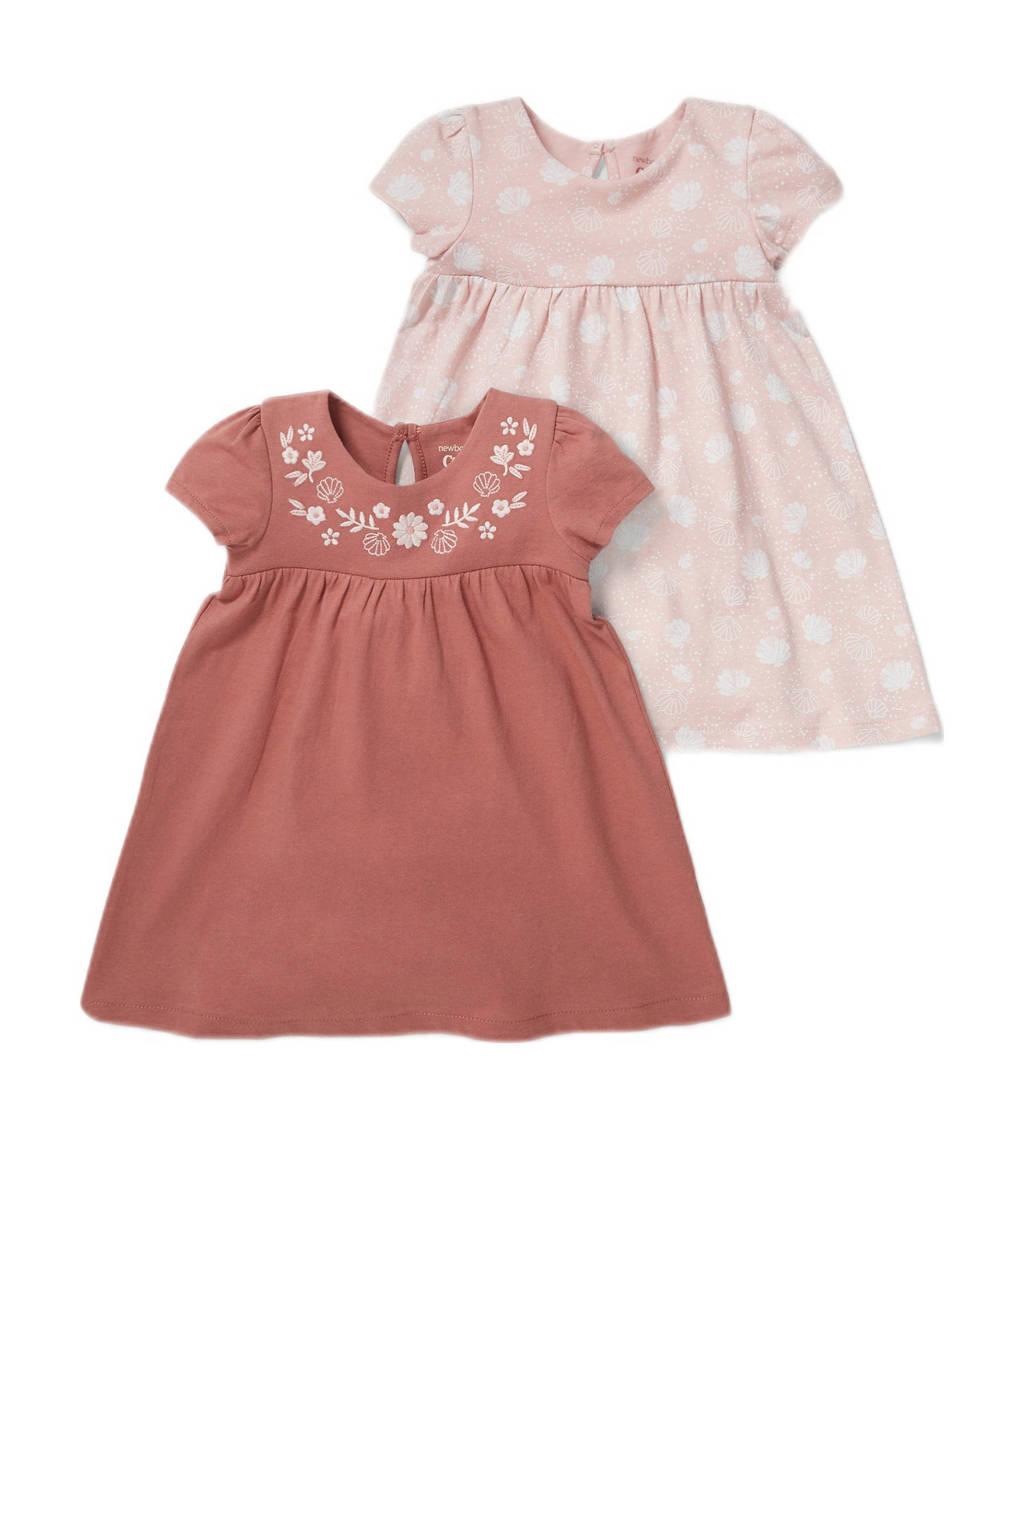 C&A Baby Club jurk - set van 2 oudroze/roodbruin, Roodbruin/roze